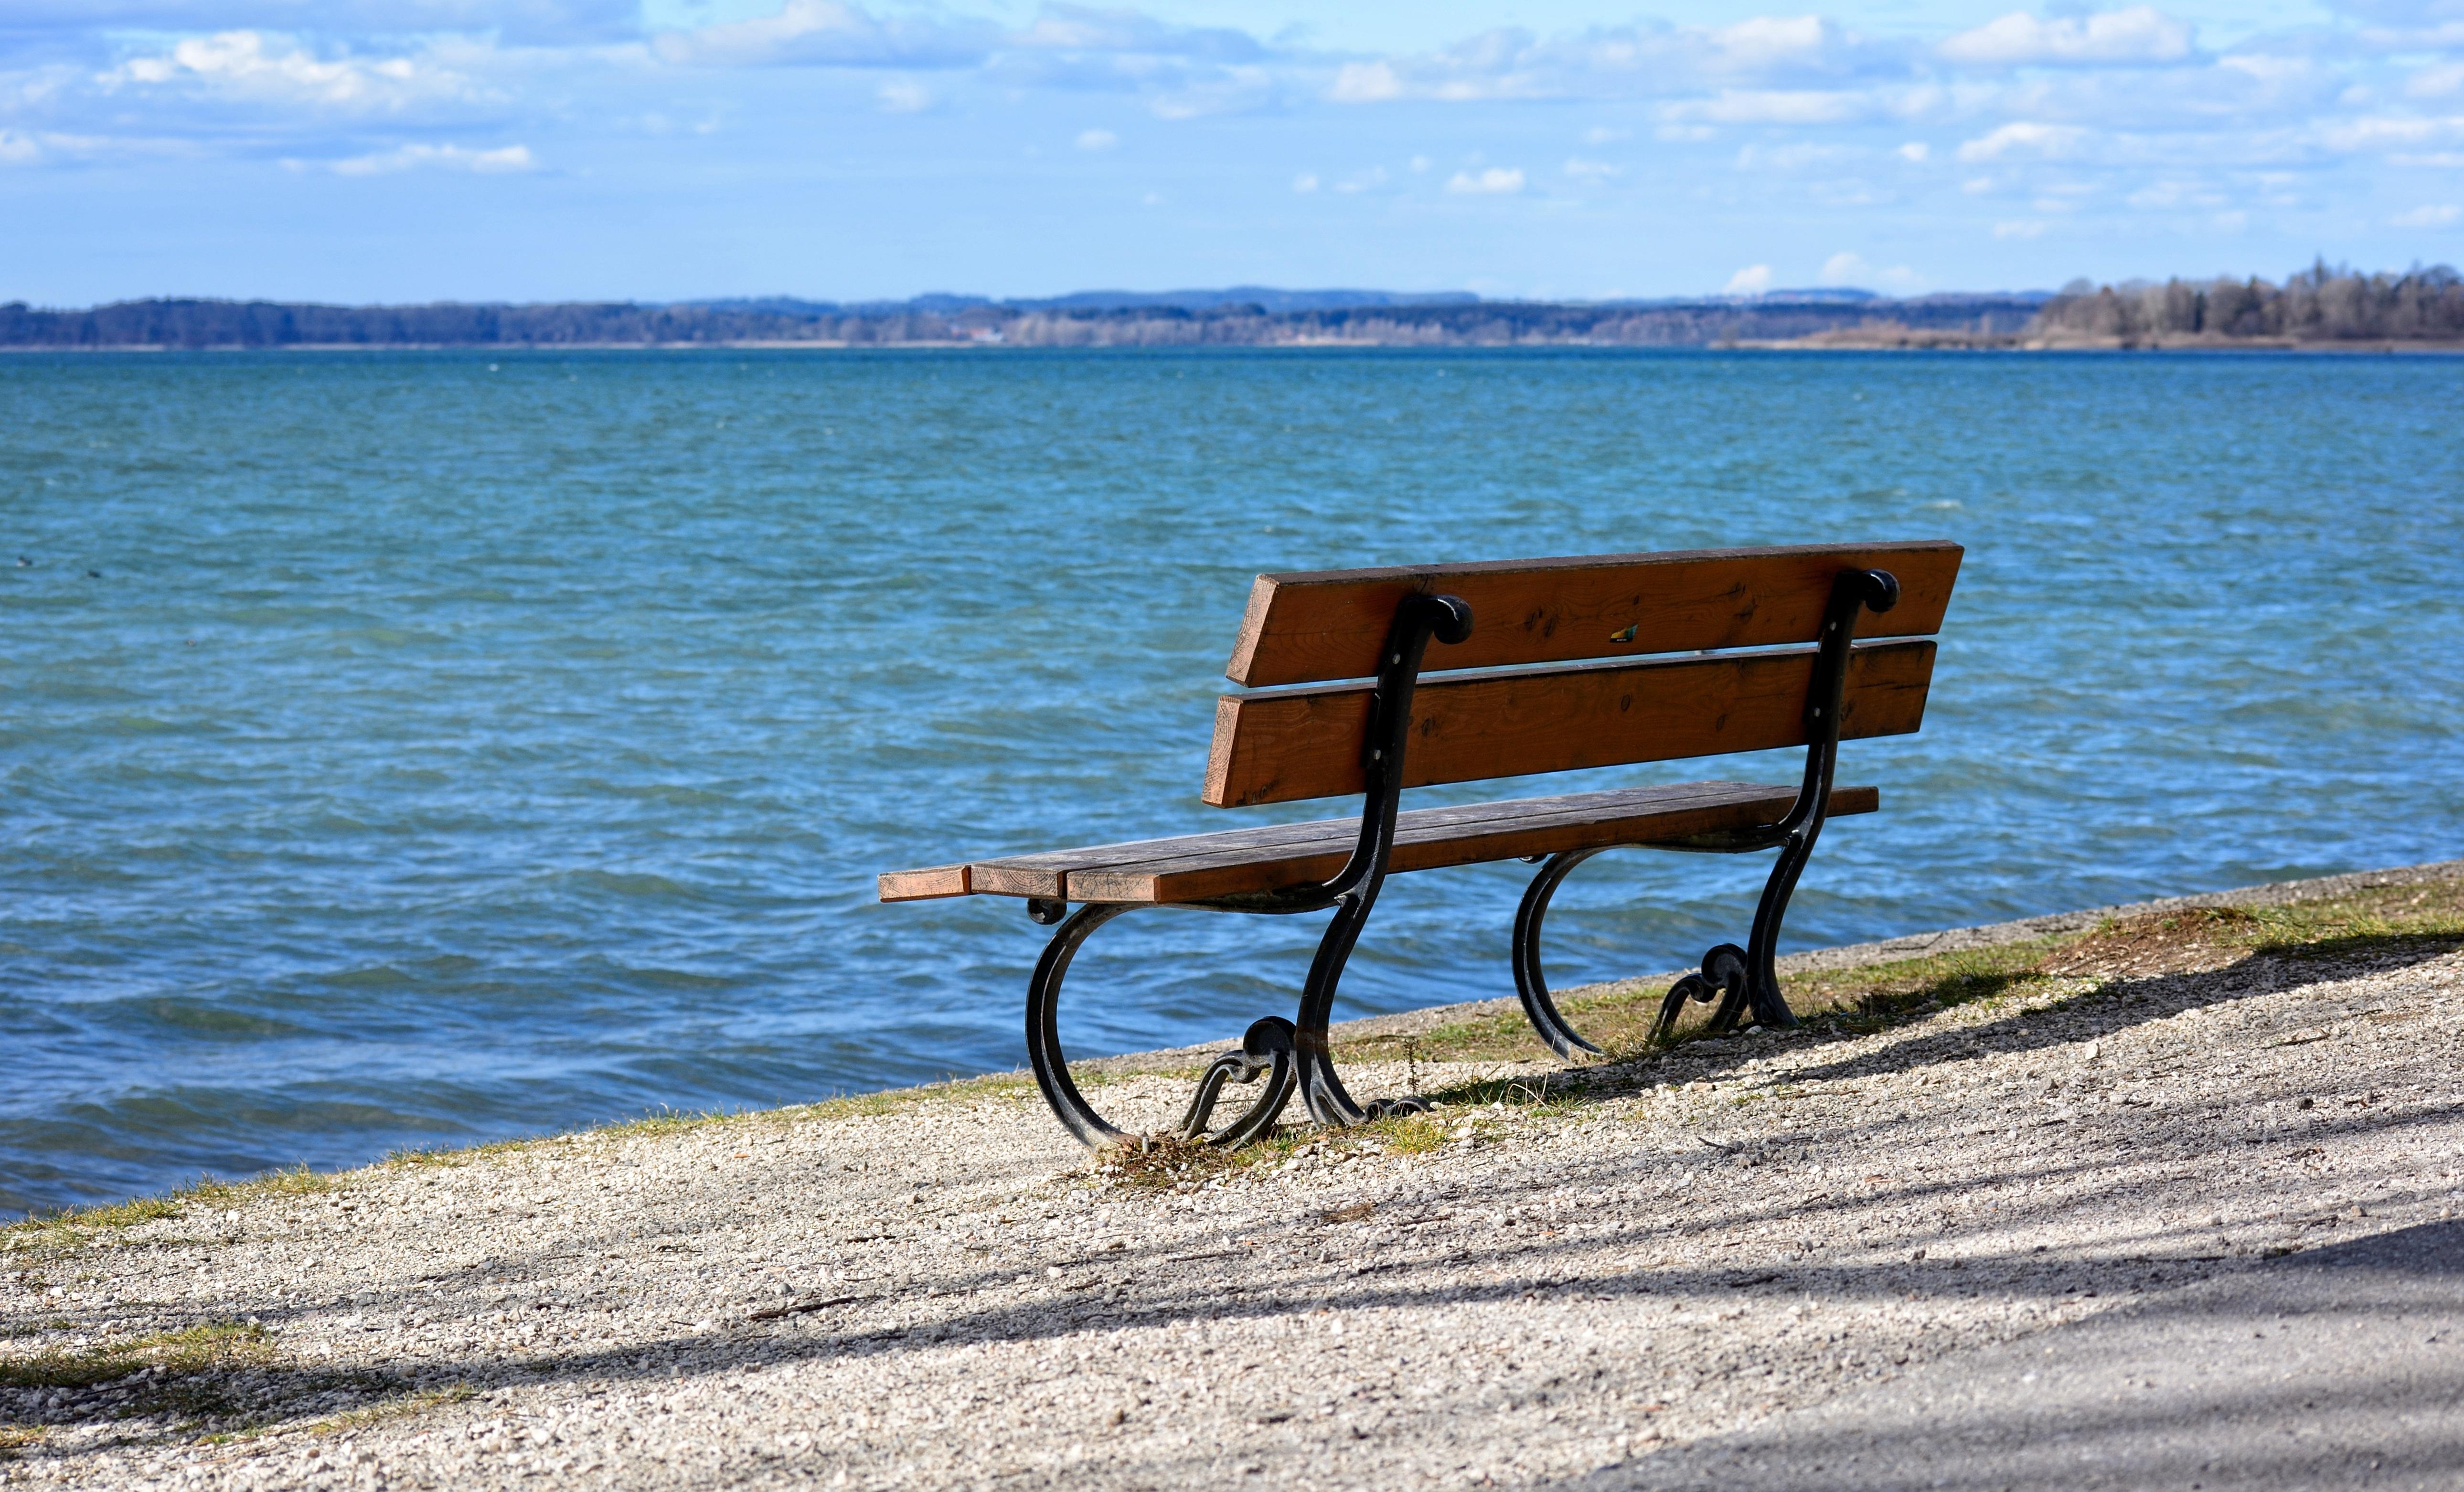 Fotos gratis playa mar costa naturaleza banco - Mueble banco asiento ...